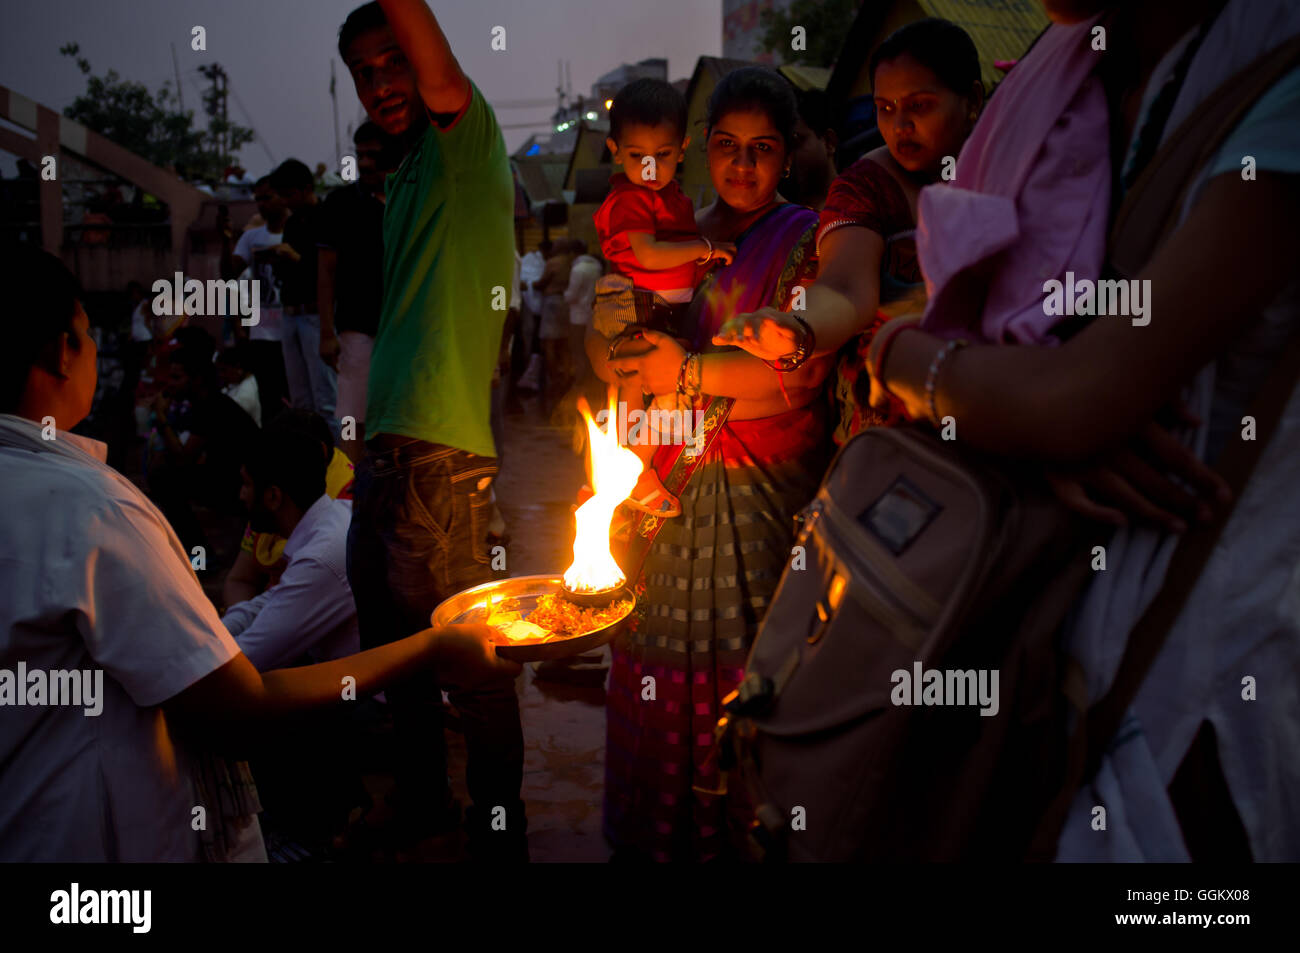 File Image - Hinduist  worshippers are seen in Haridwar, Uttarakhand, India. © Jordi Boixareu - Stock Image